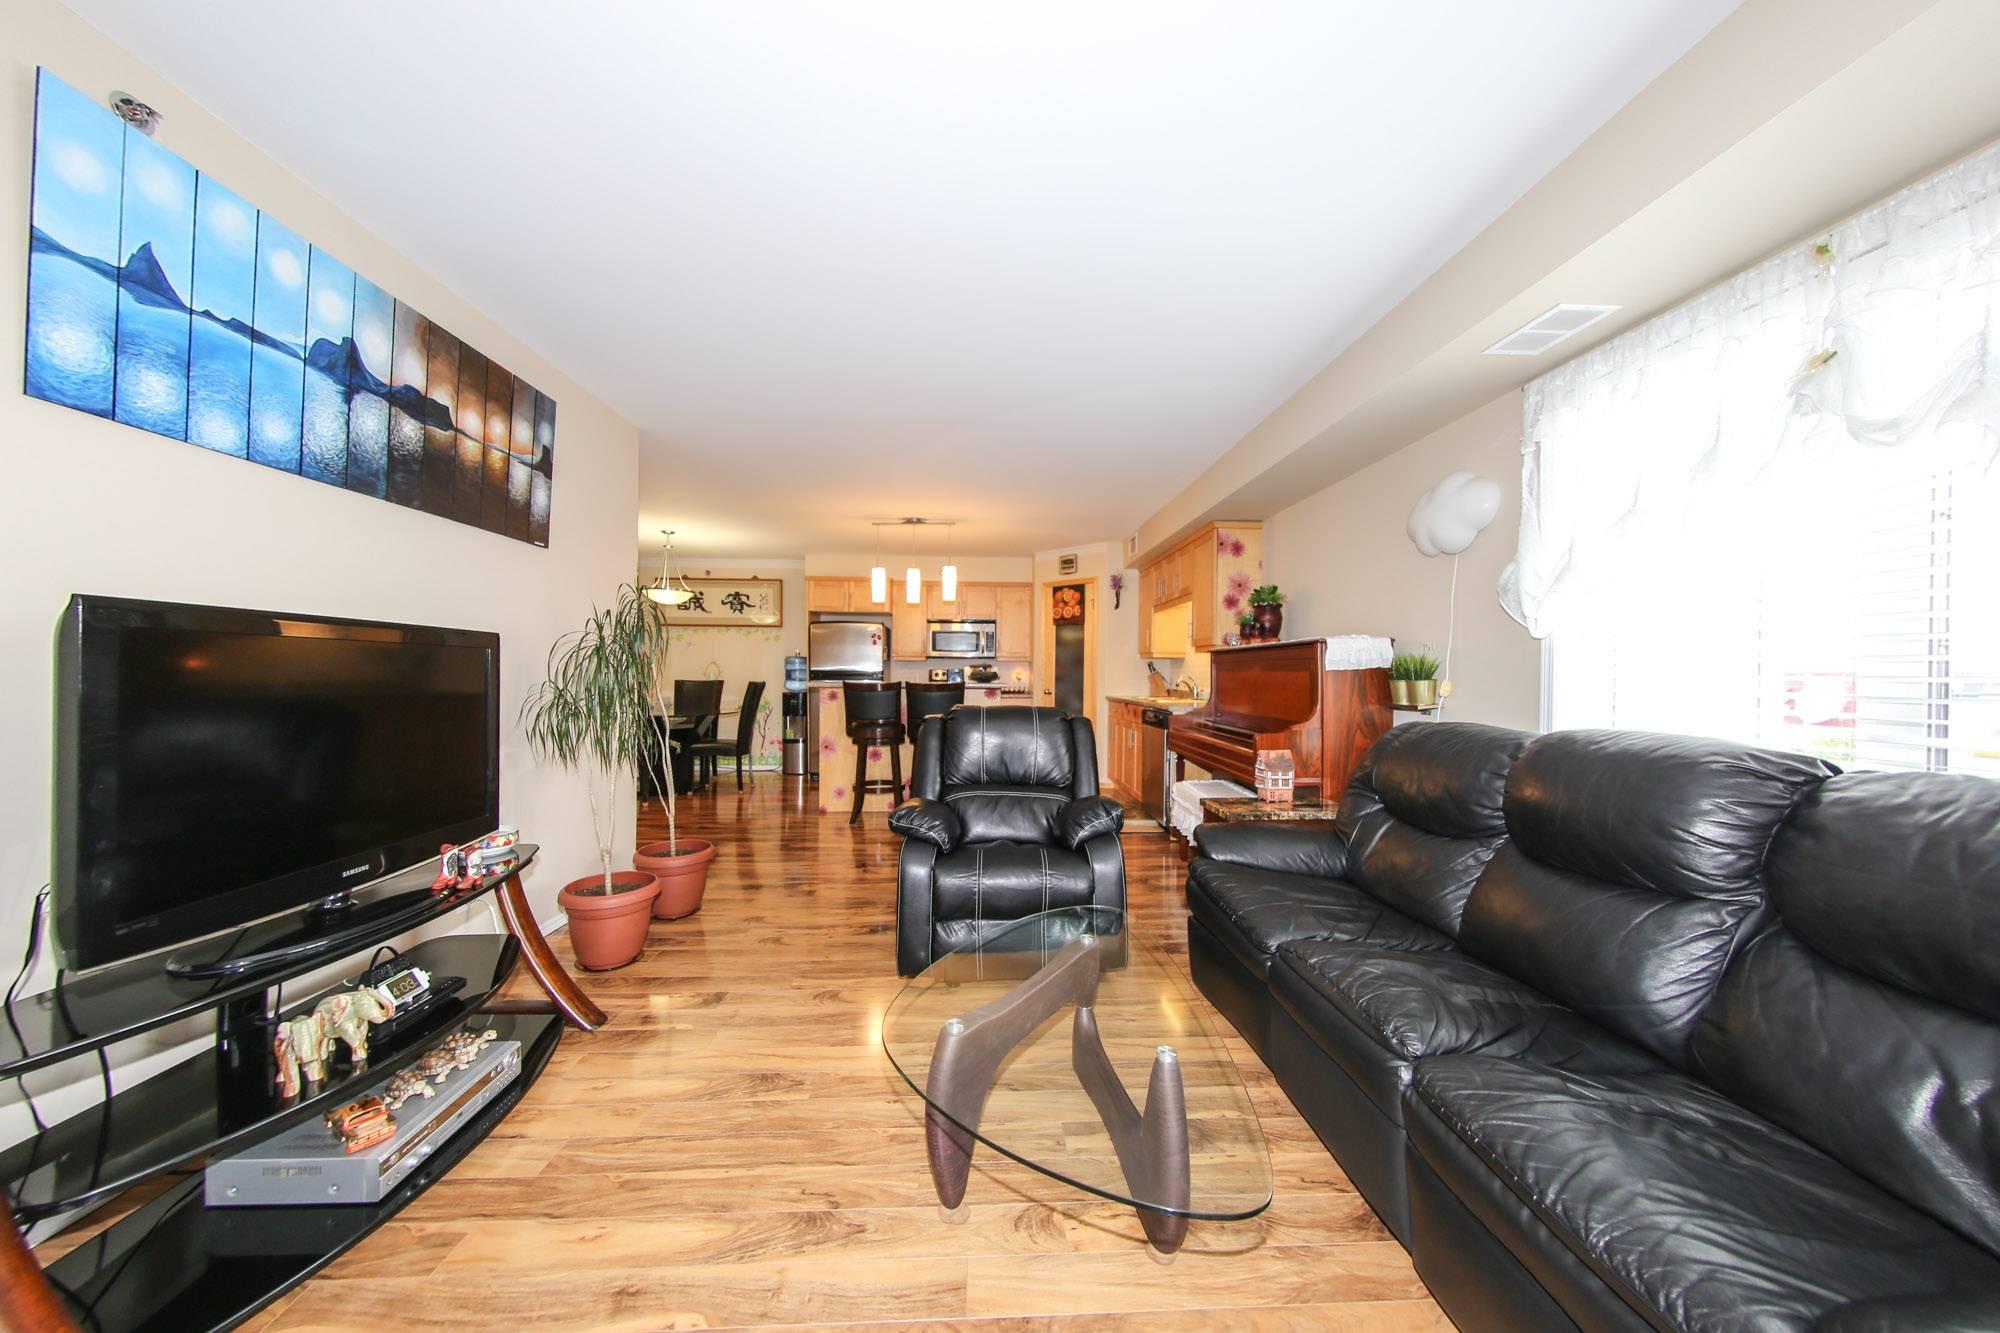 336-701 St Annes, Winnipeg, Manitoba  R2M 3B3 - Photo 16 - 1825923